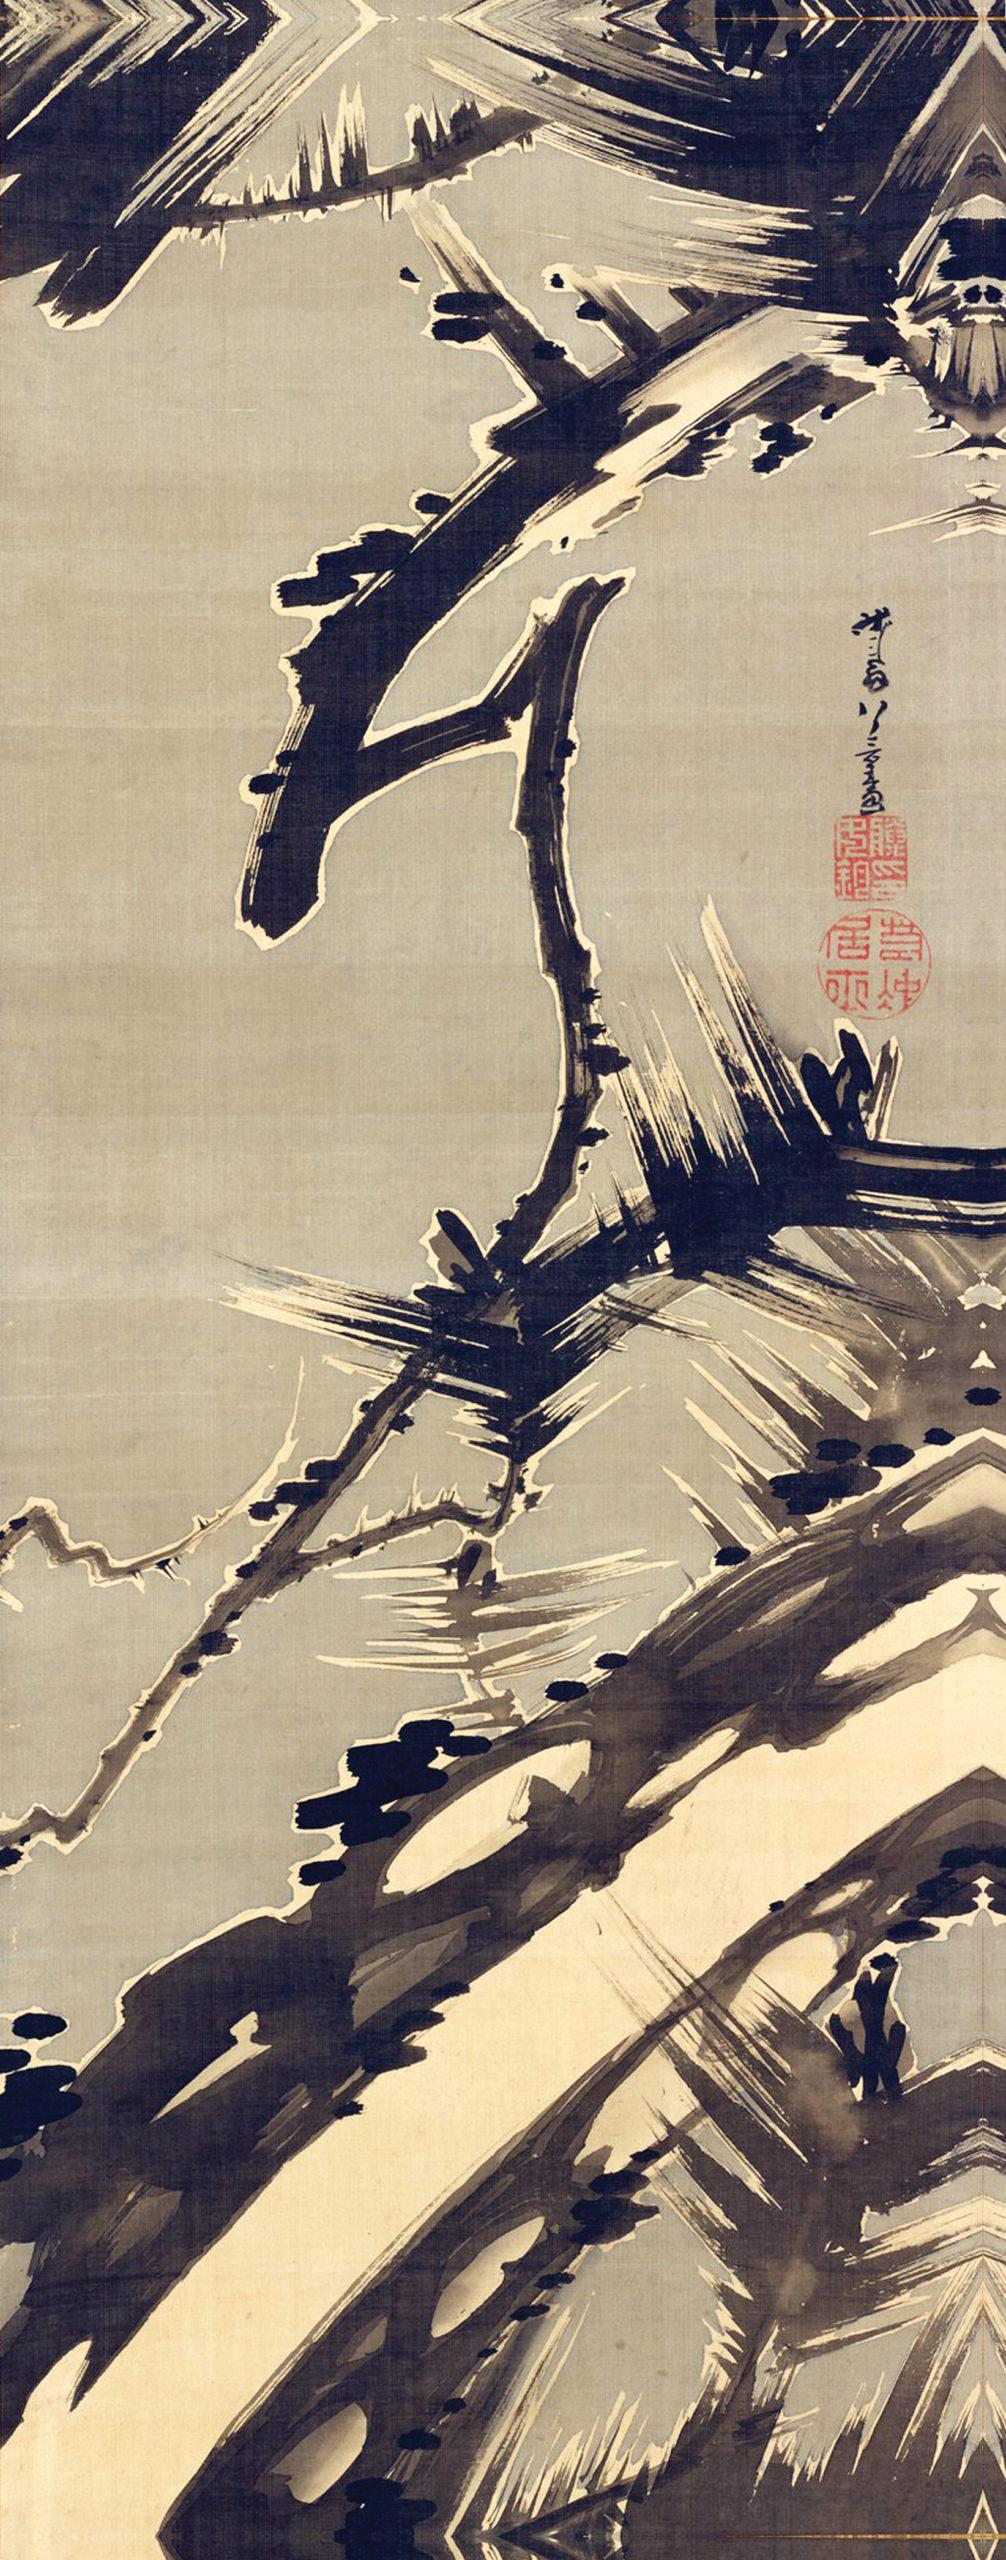 Ink painting by Itō Jakuchu of Japanese black pine